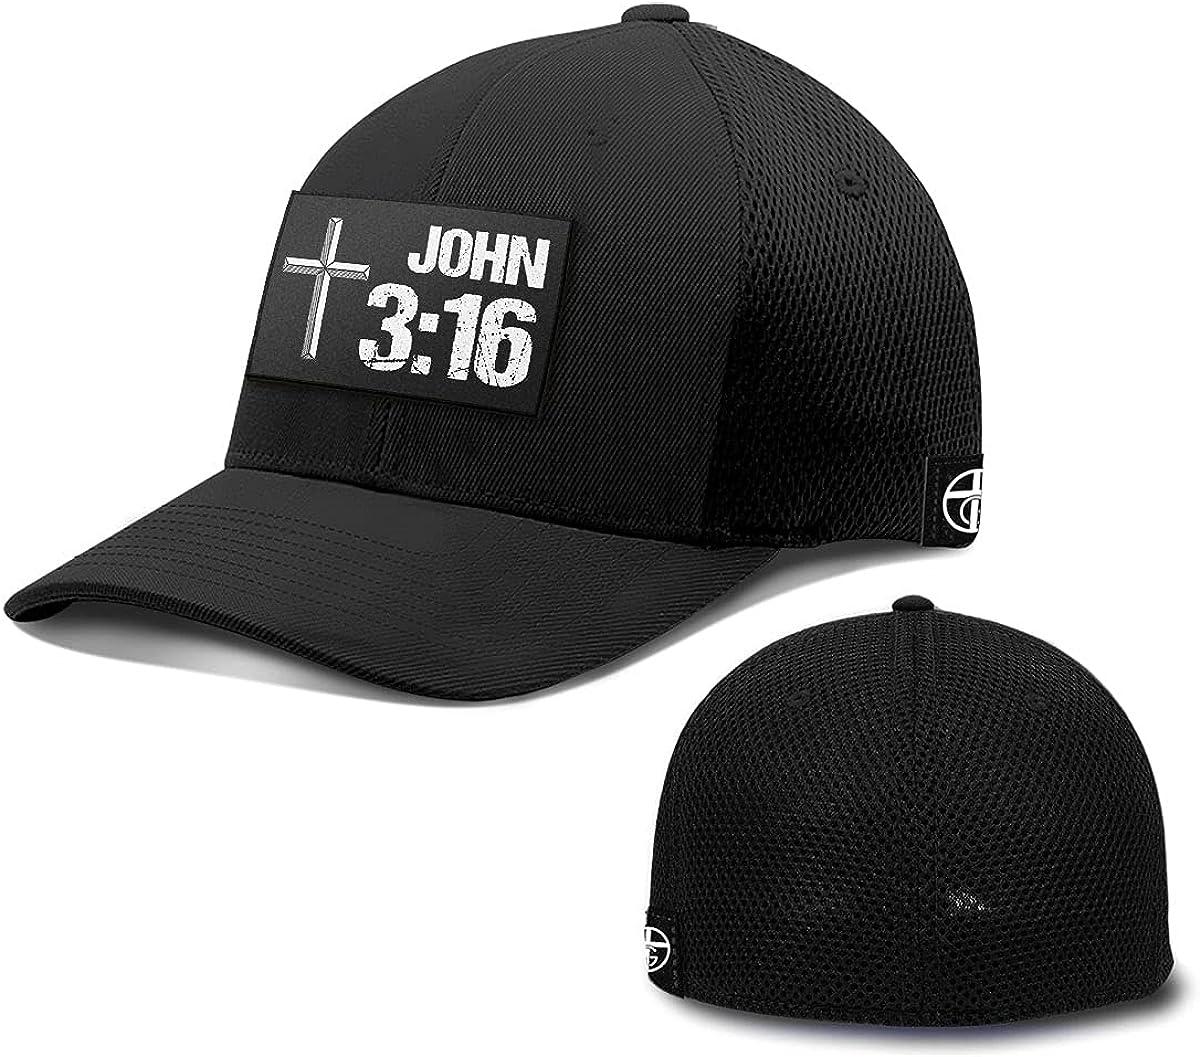 One True God John 3:16 Patch Flexfit Hat Christian Bible Quote Baseball Cap